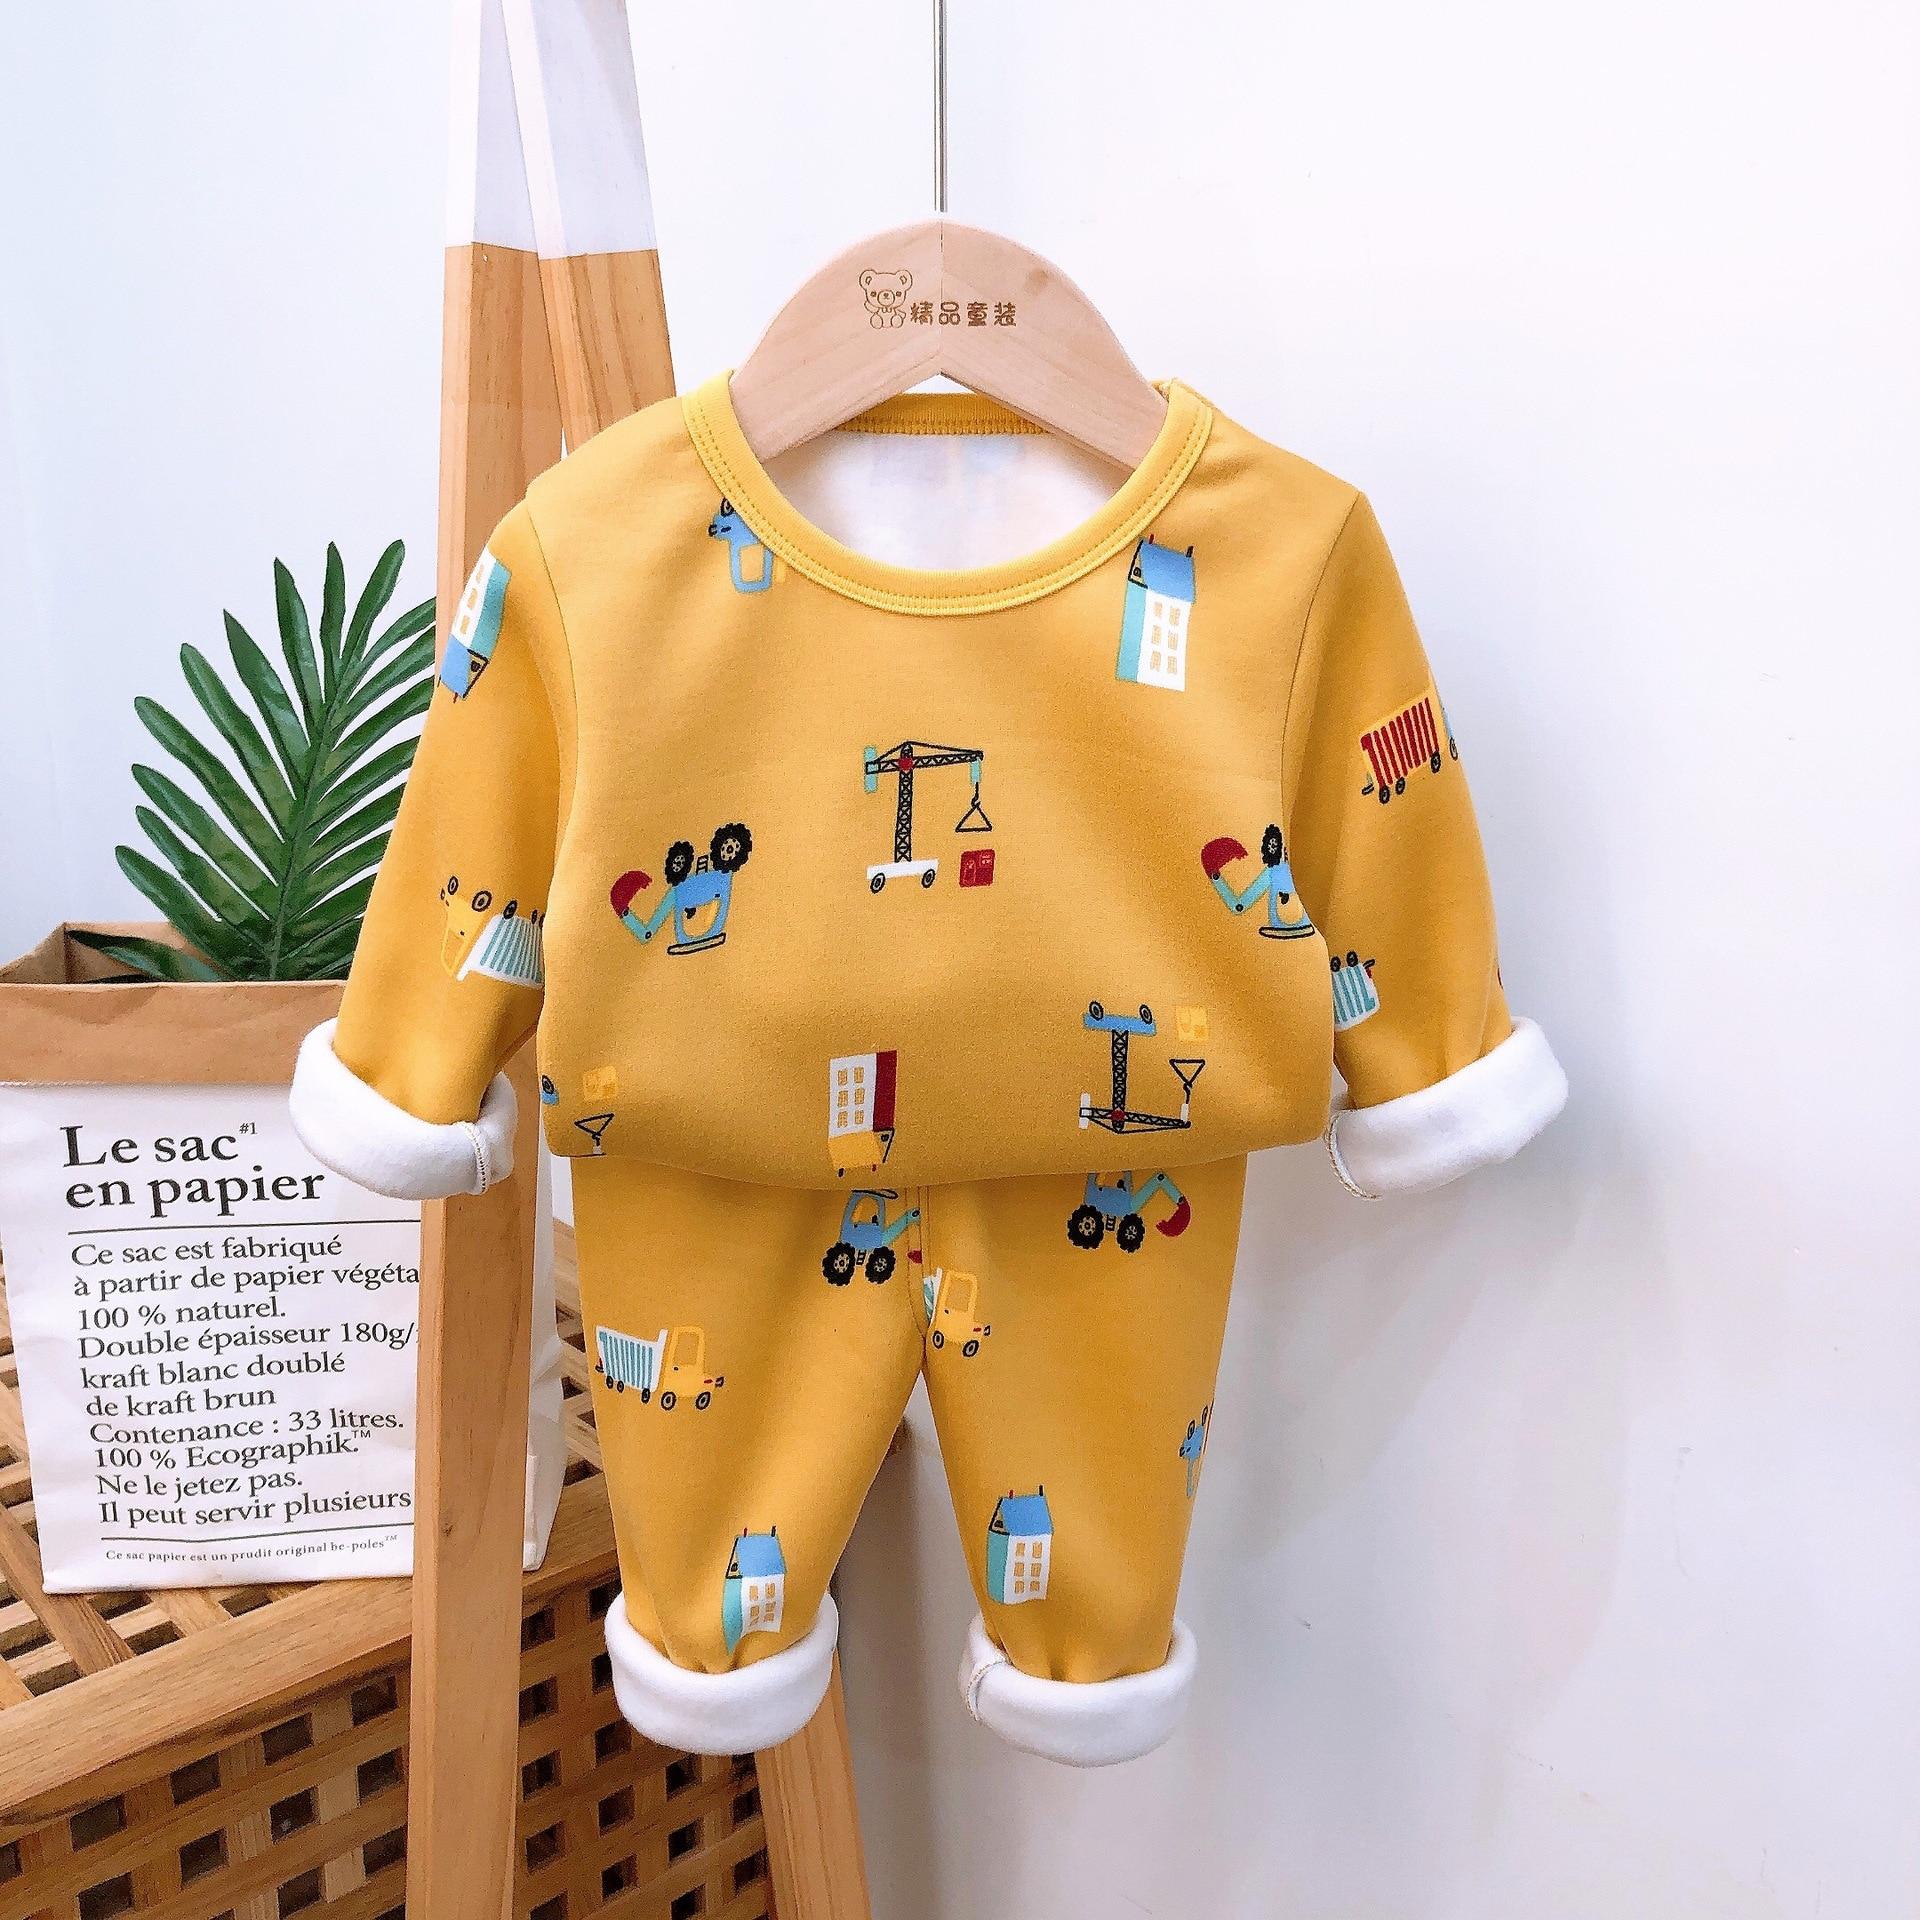 2021 Autumn Winter Thicken Velvet Children Pajamas Cartoon Family Boys Girls Clothing Set Kids Casual Sleepwear Suits Clothes 4